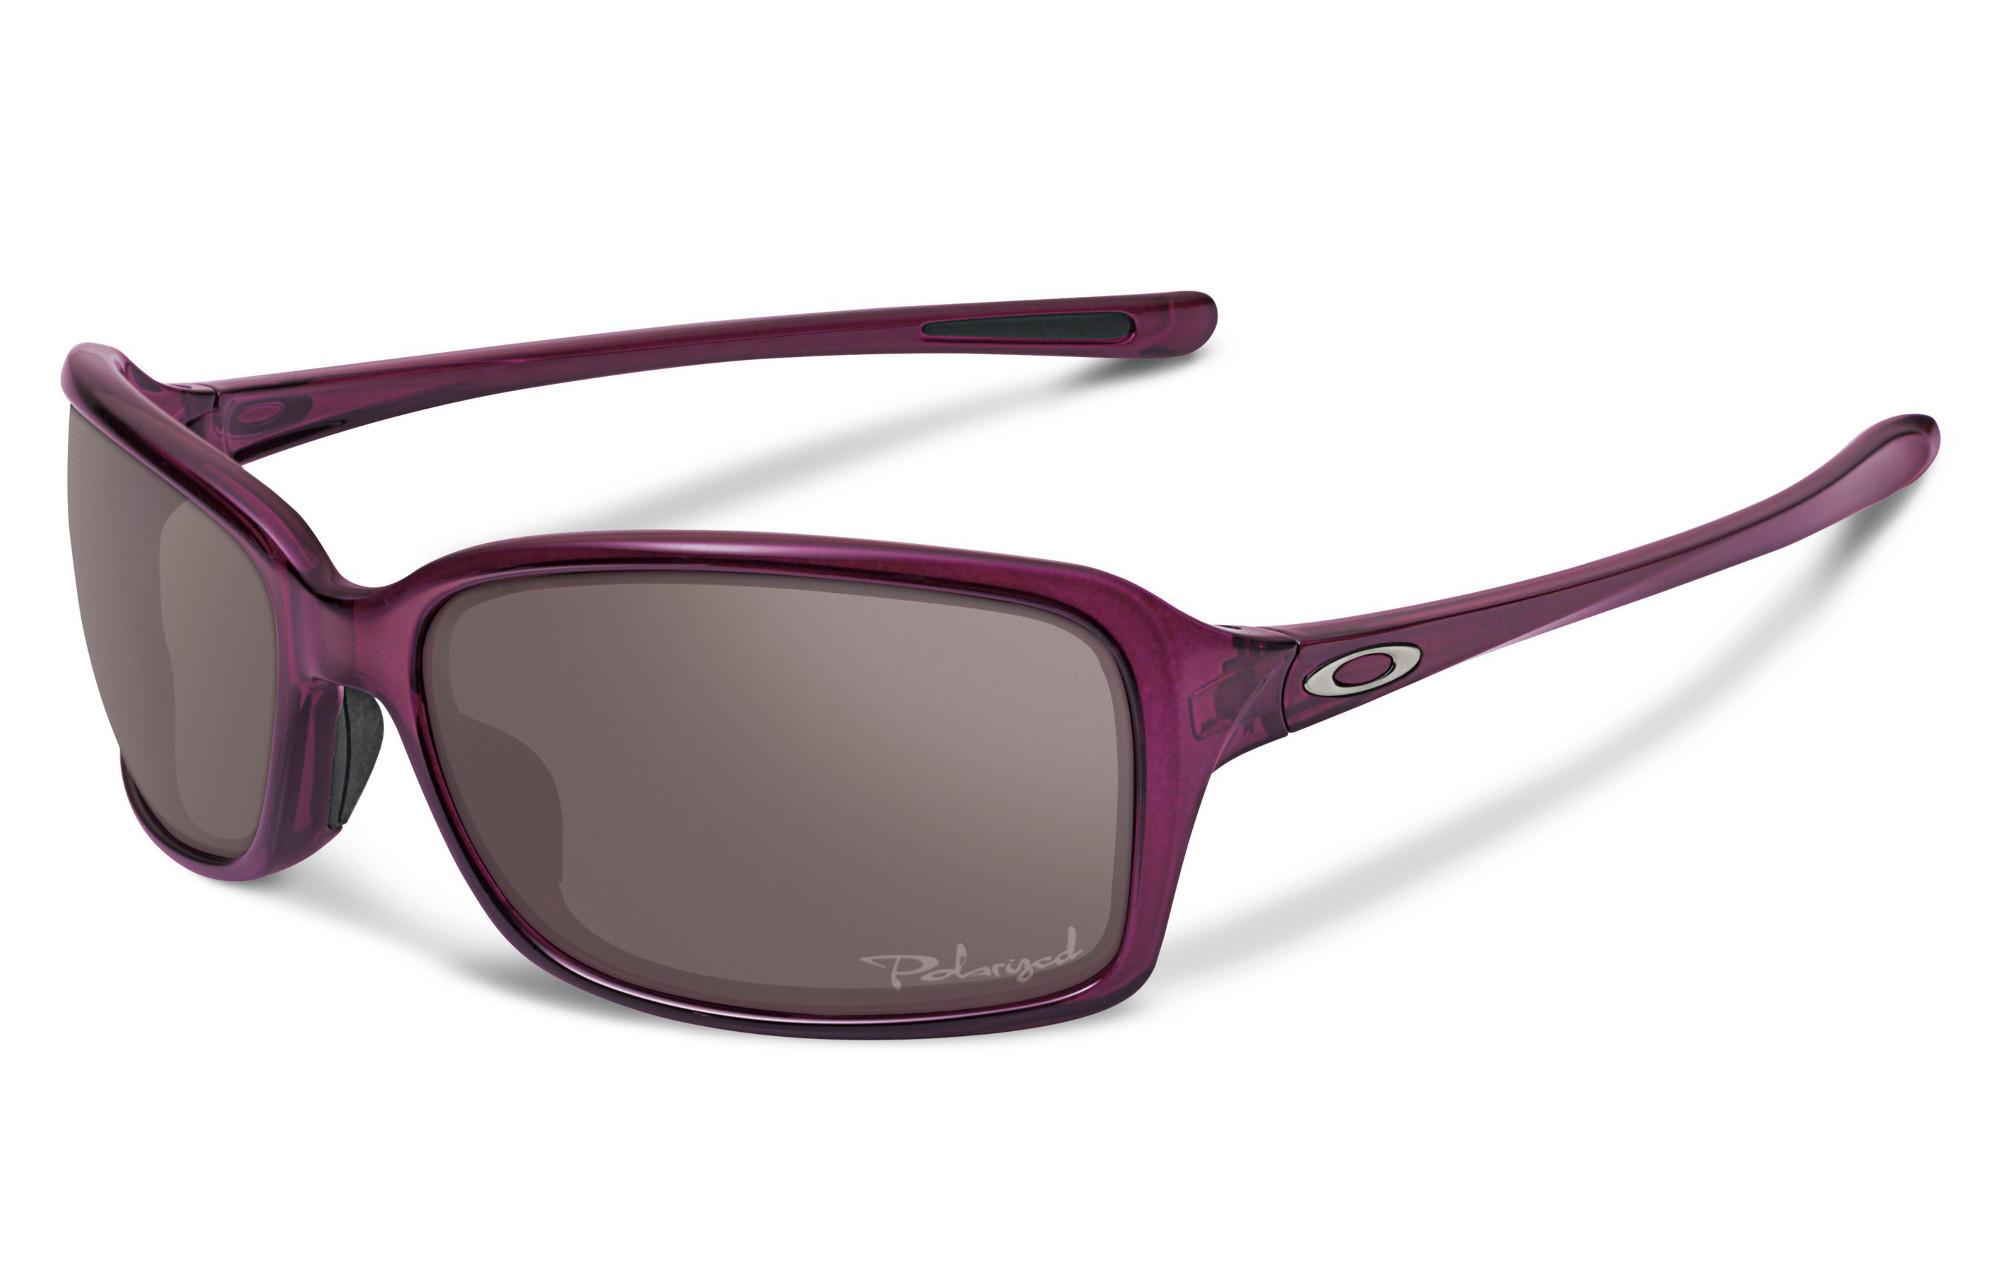 c09bfa8531 OAKLEY Woman Sunglasses DISPUTE Crystal Raspberry Grey Polarized Ref OO9233- 04